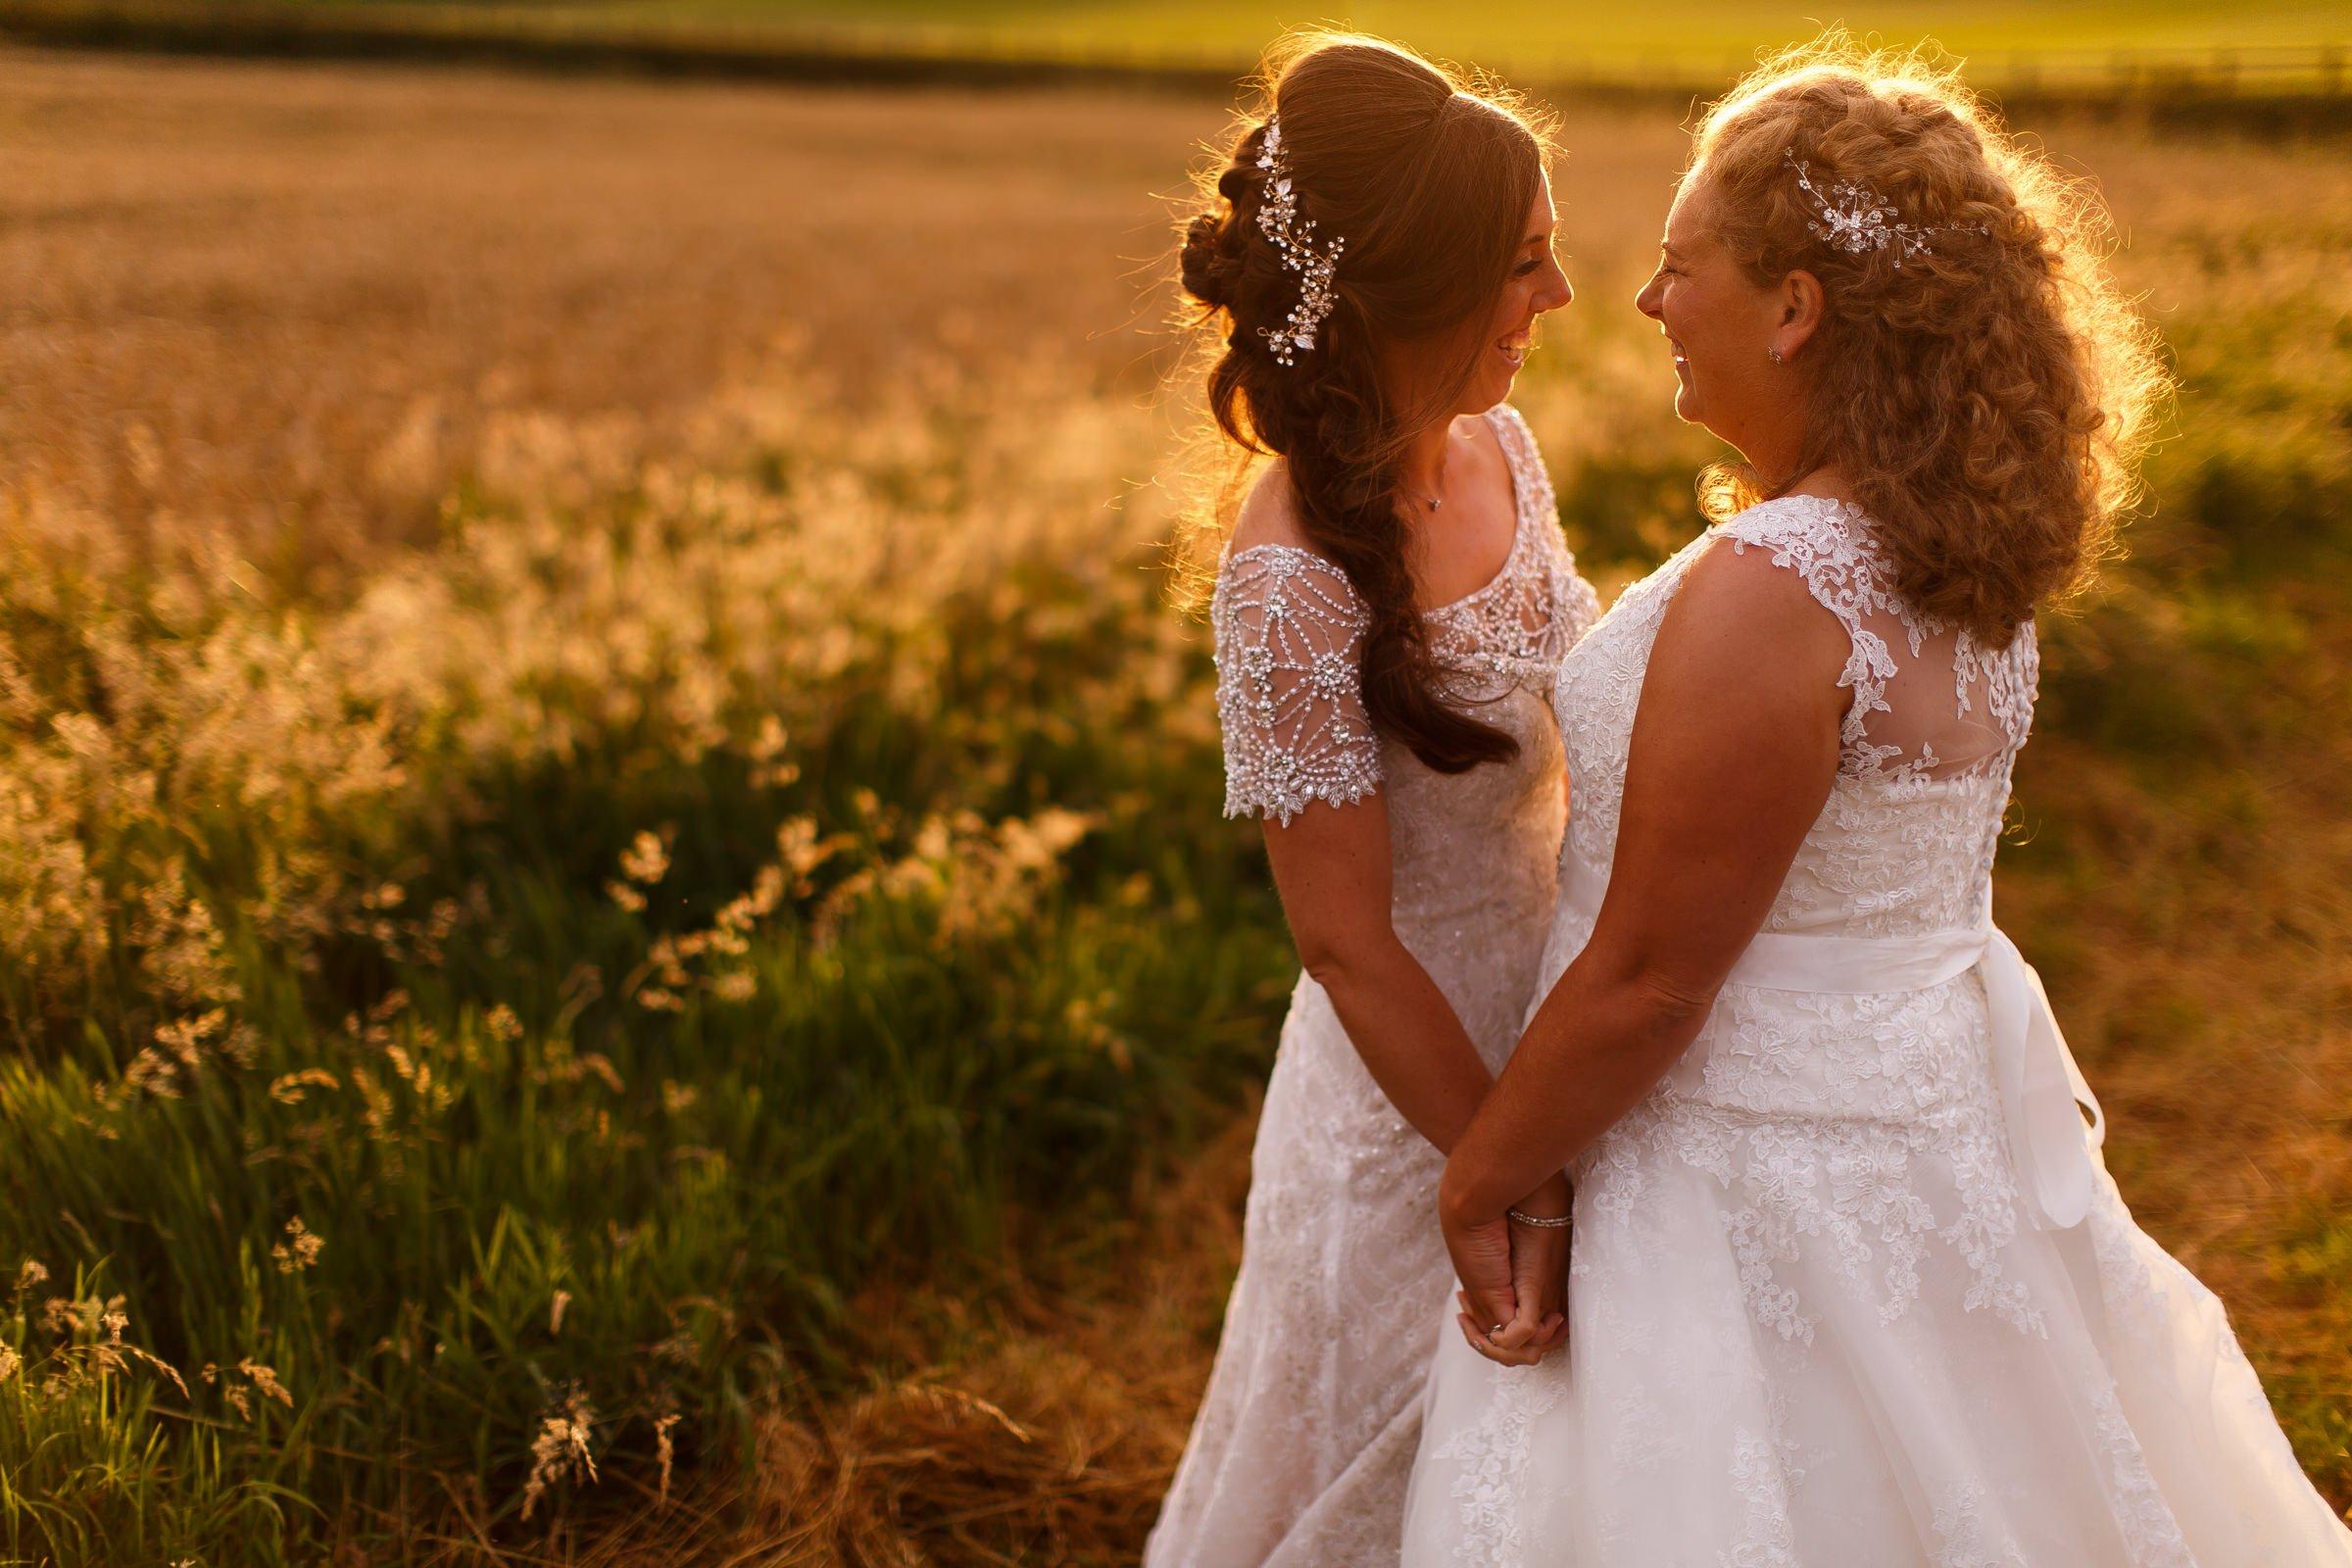 Beautiful same sex wedding photography